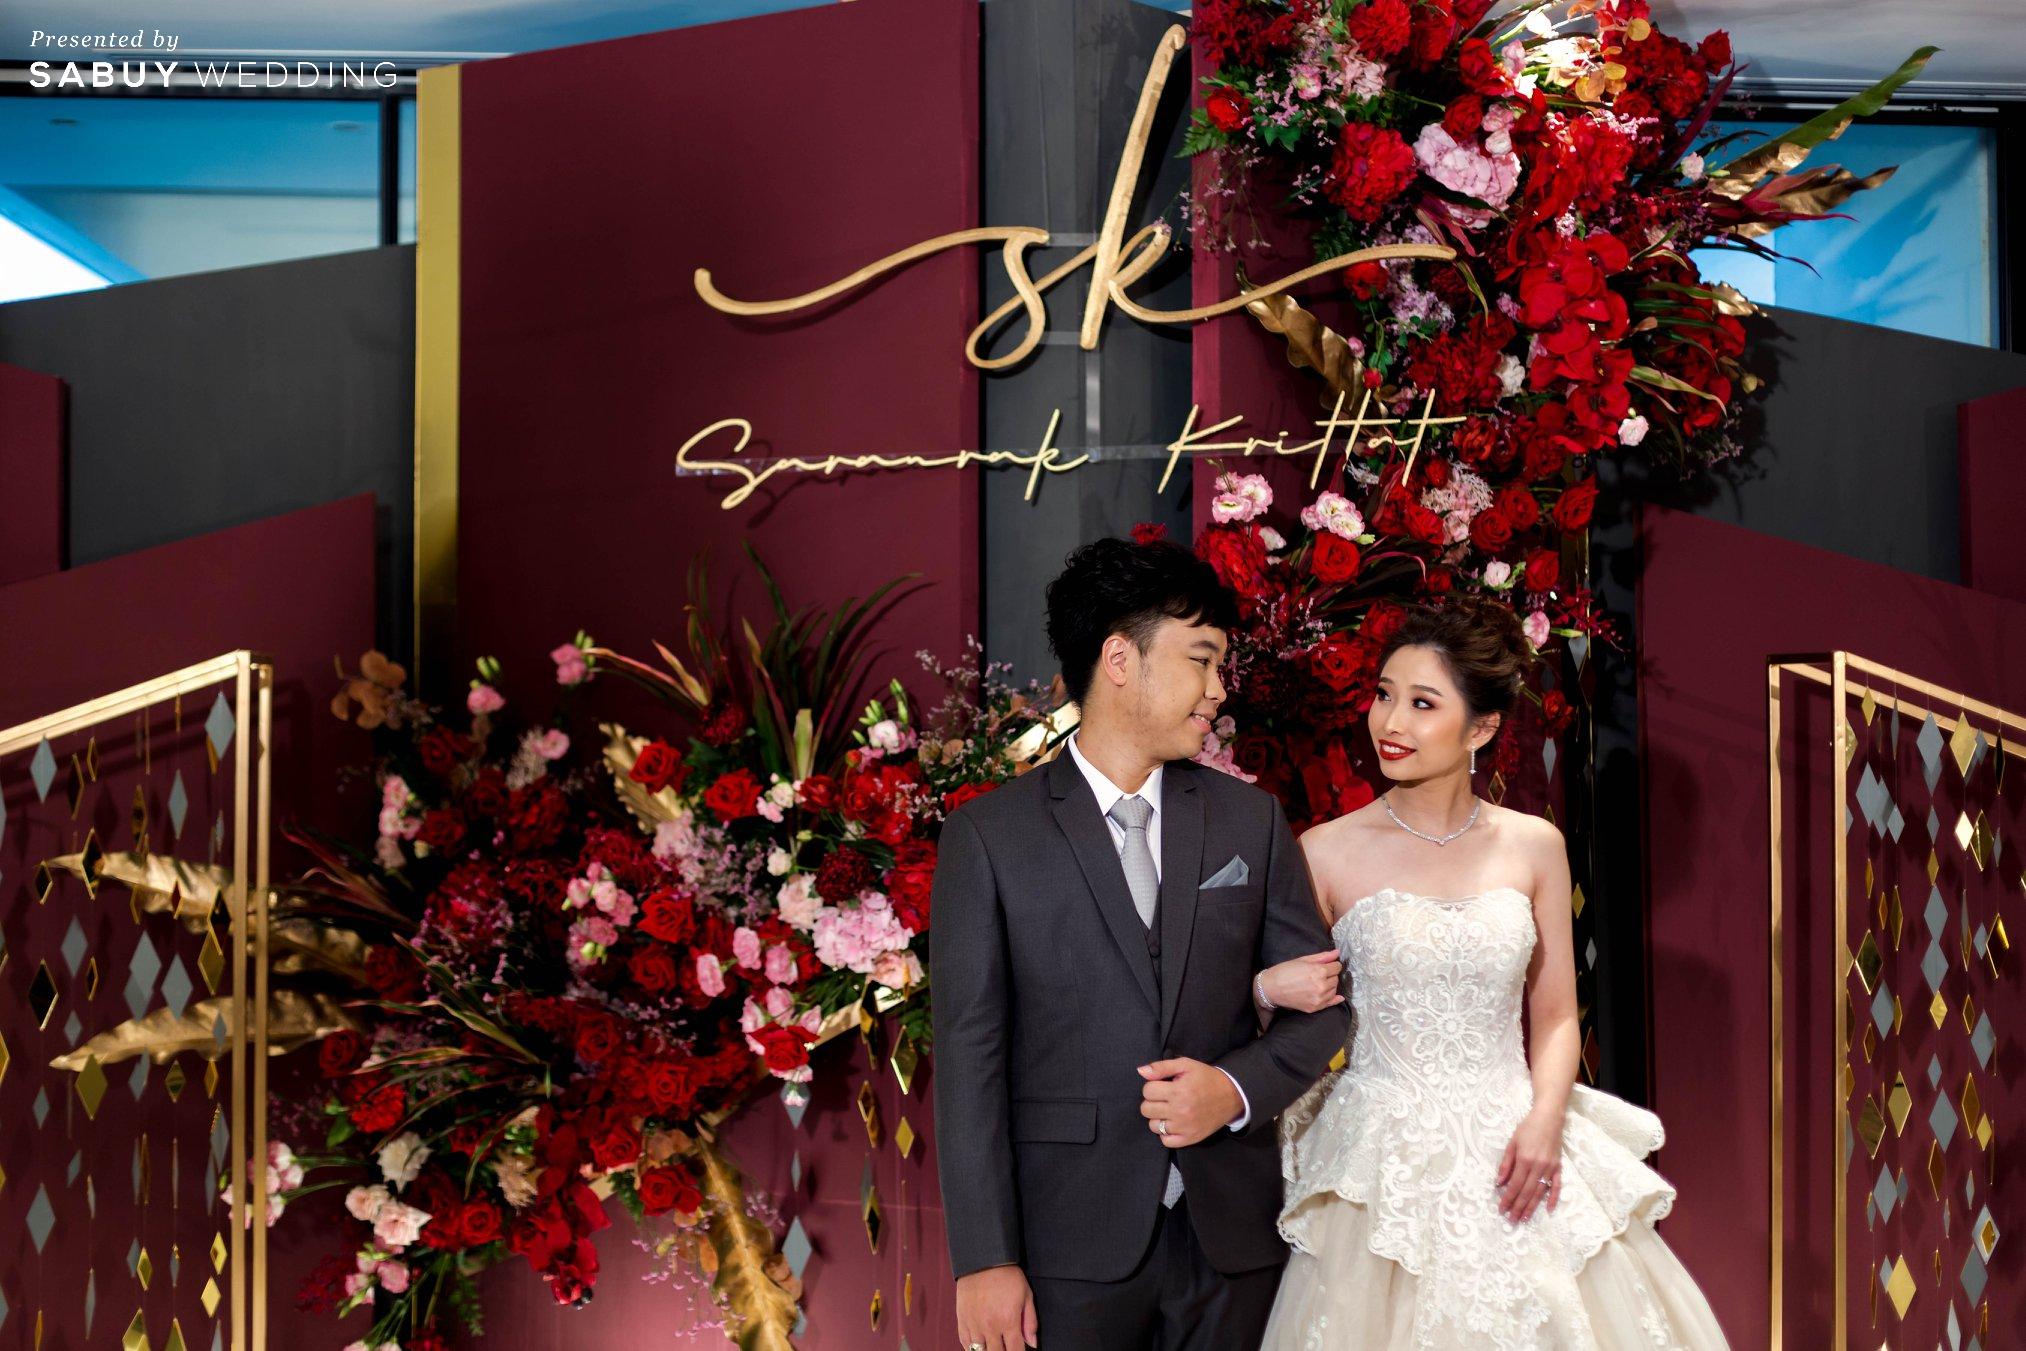 backdrop,เจ้าบ่าว,เจ้าสาว,ตกแต่งงานแต่ง,ออแกไนเซอร์ รีวิวงานแต่งสวยปังดูแพง กับโทนสี Red Burgundy @ Chatrium Hotel Riverside Bangkok